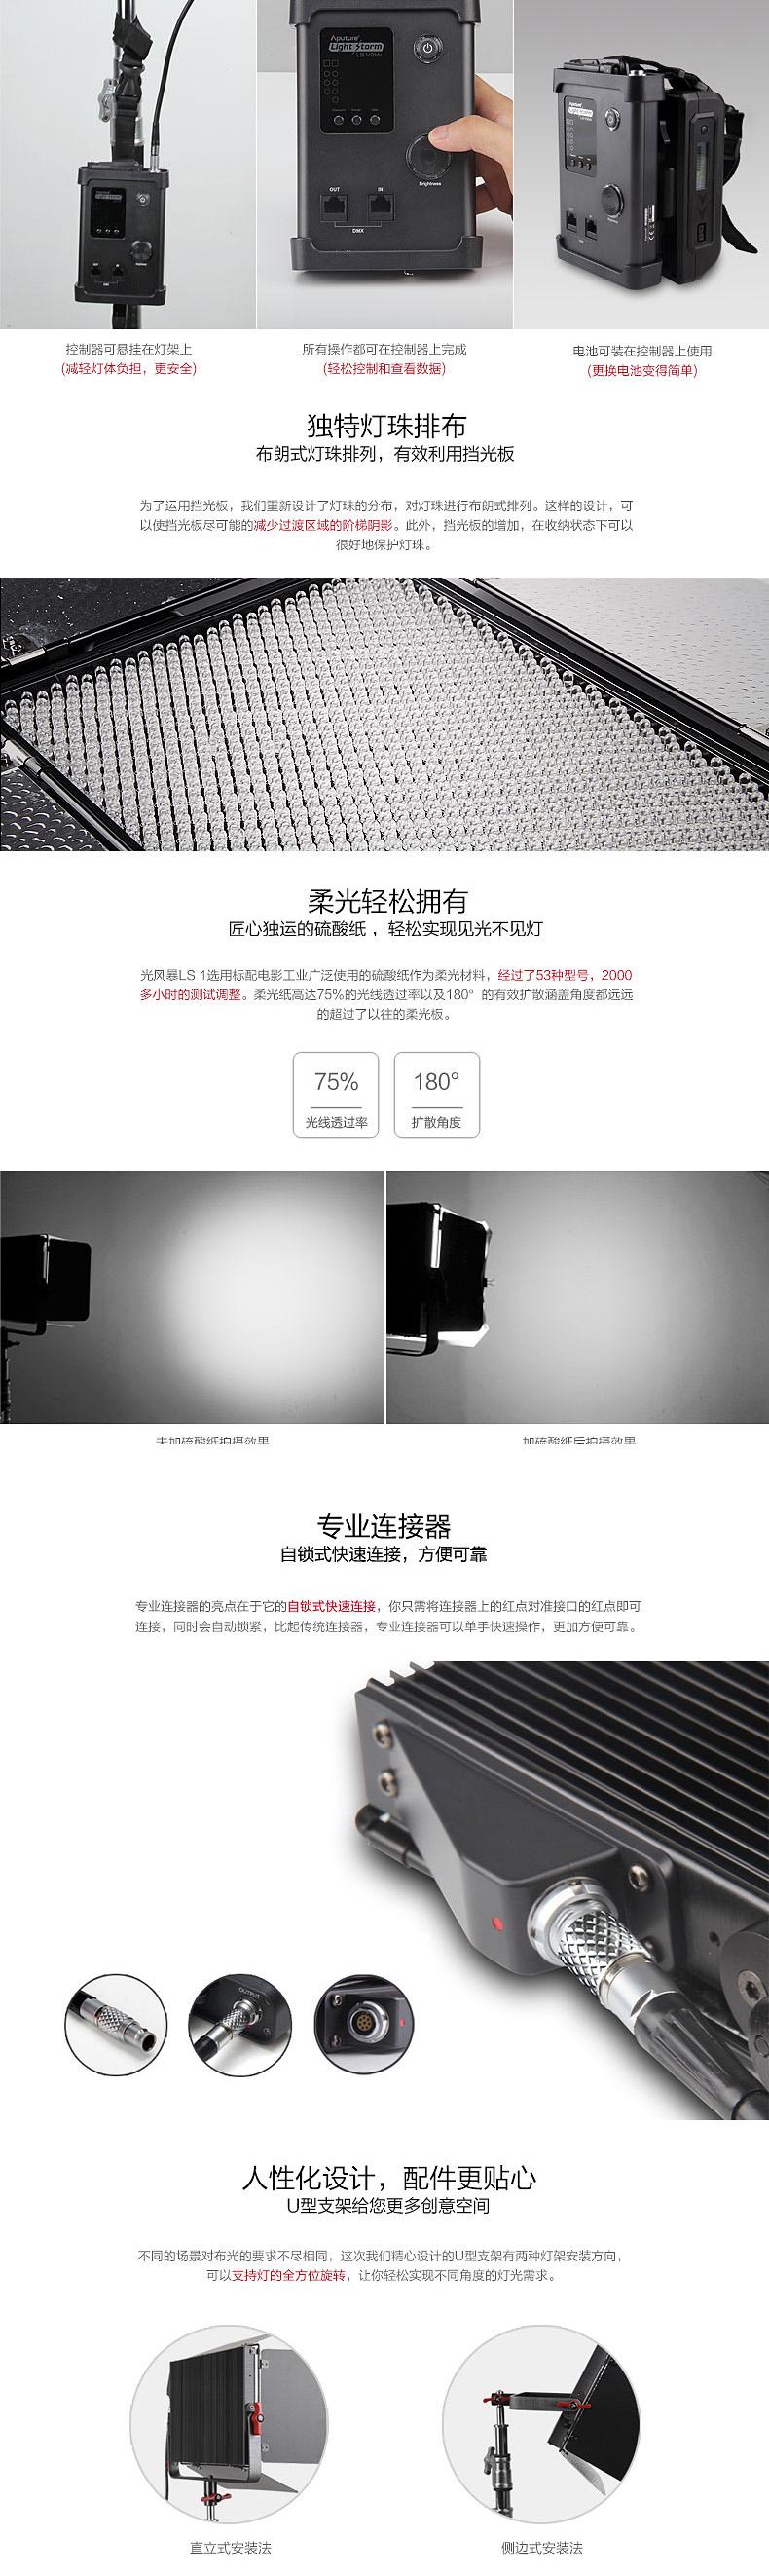 aputure-ls-1s-daylight-led-studio-light-yingkee4.jpg